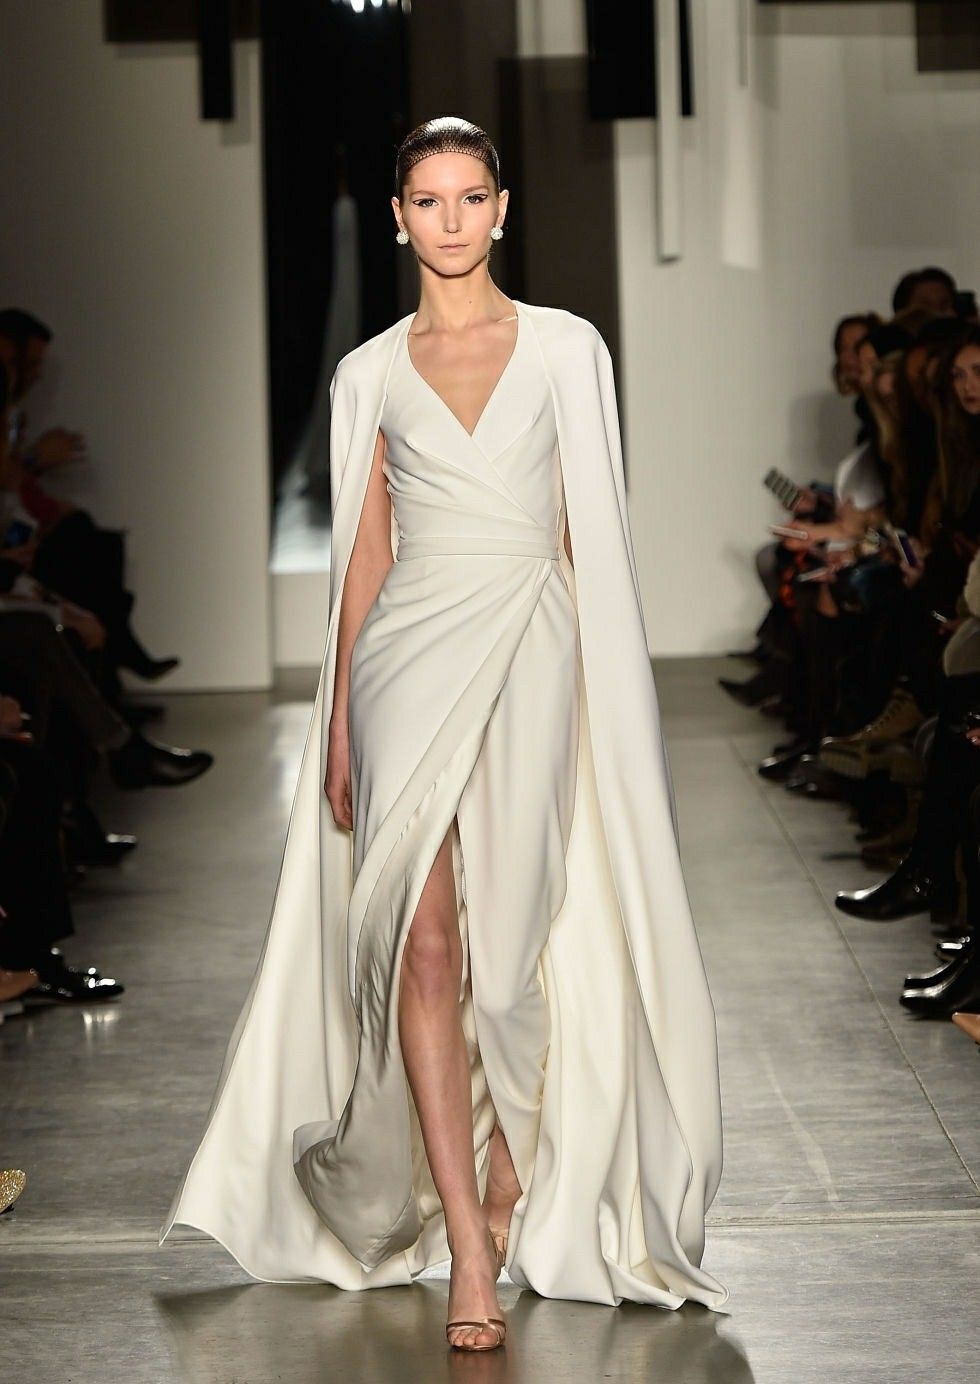 Cream gown cape fashion show dresses